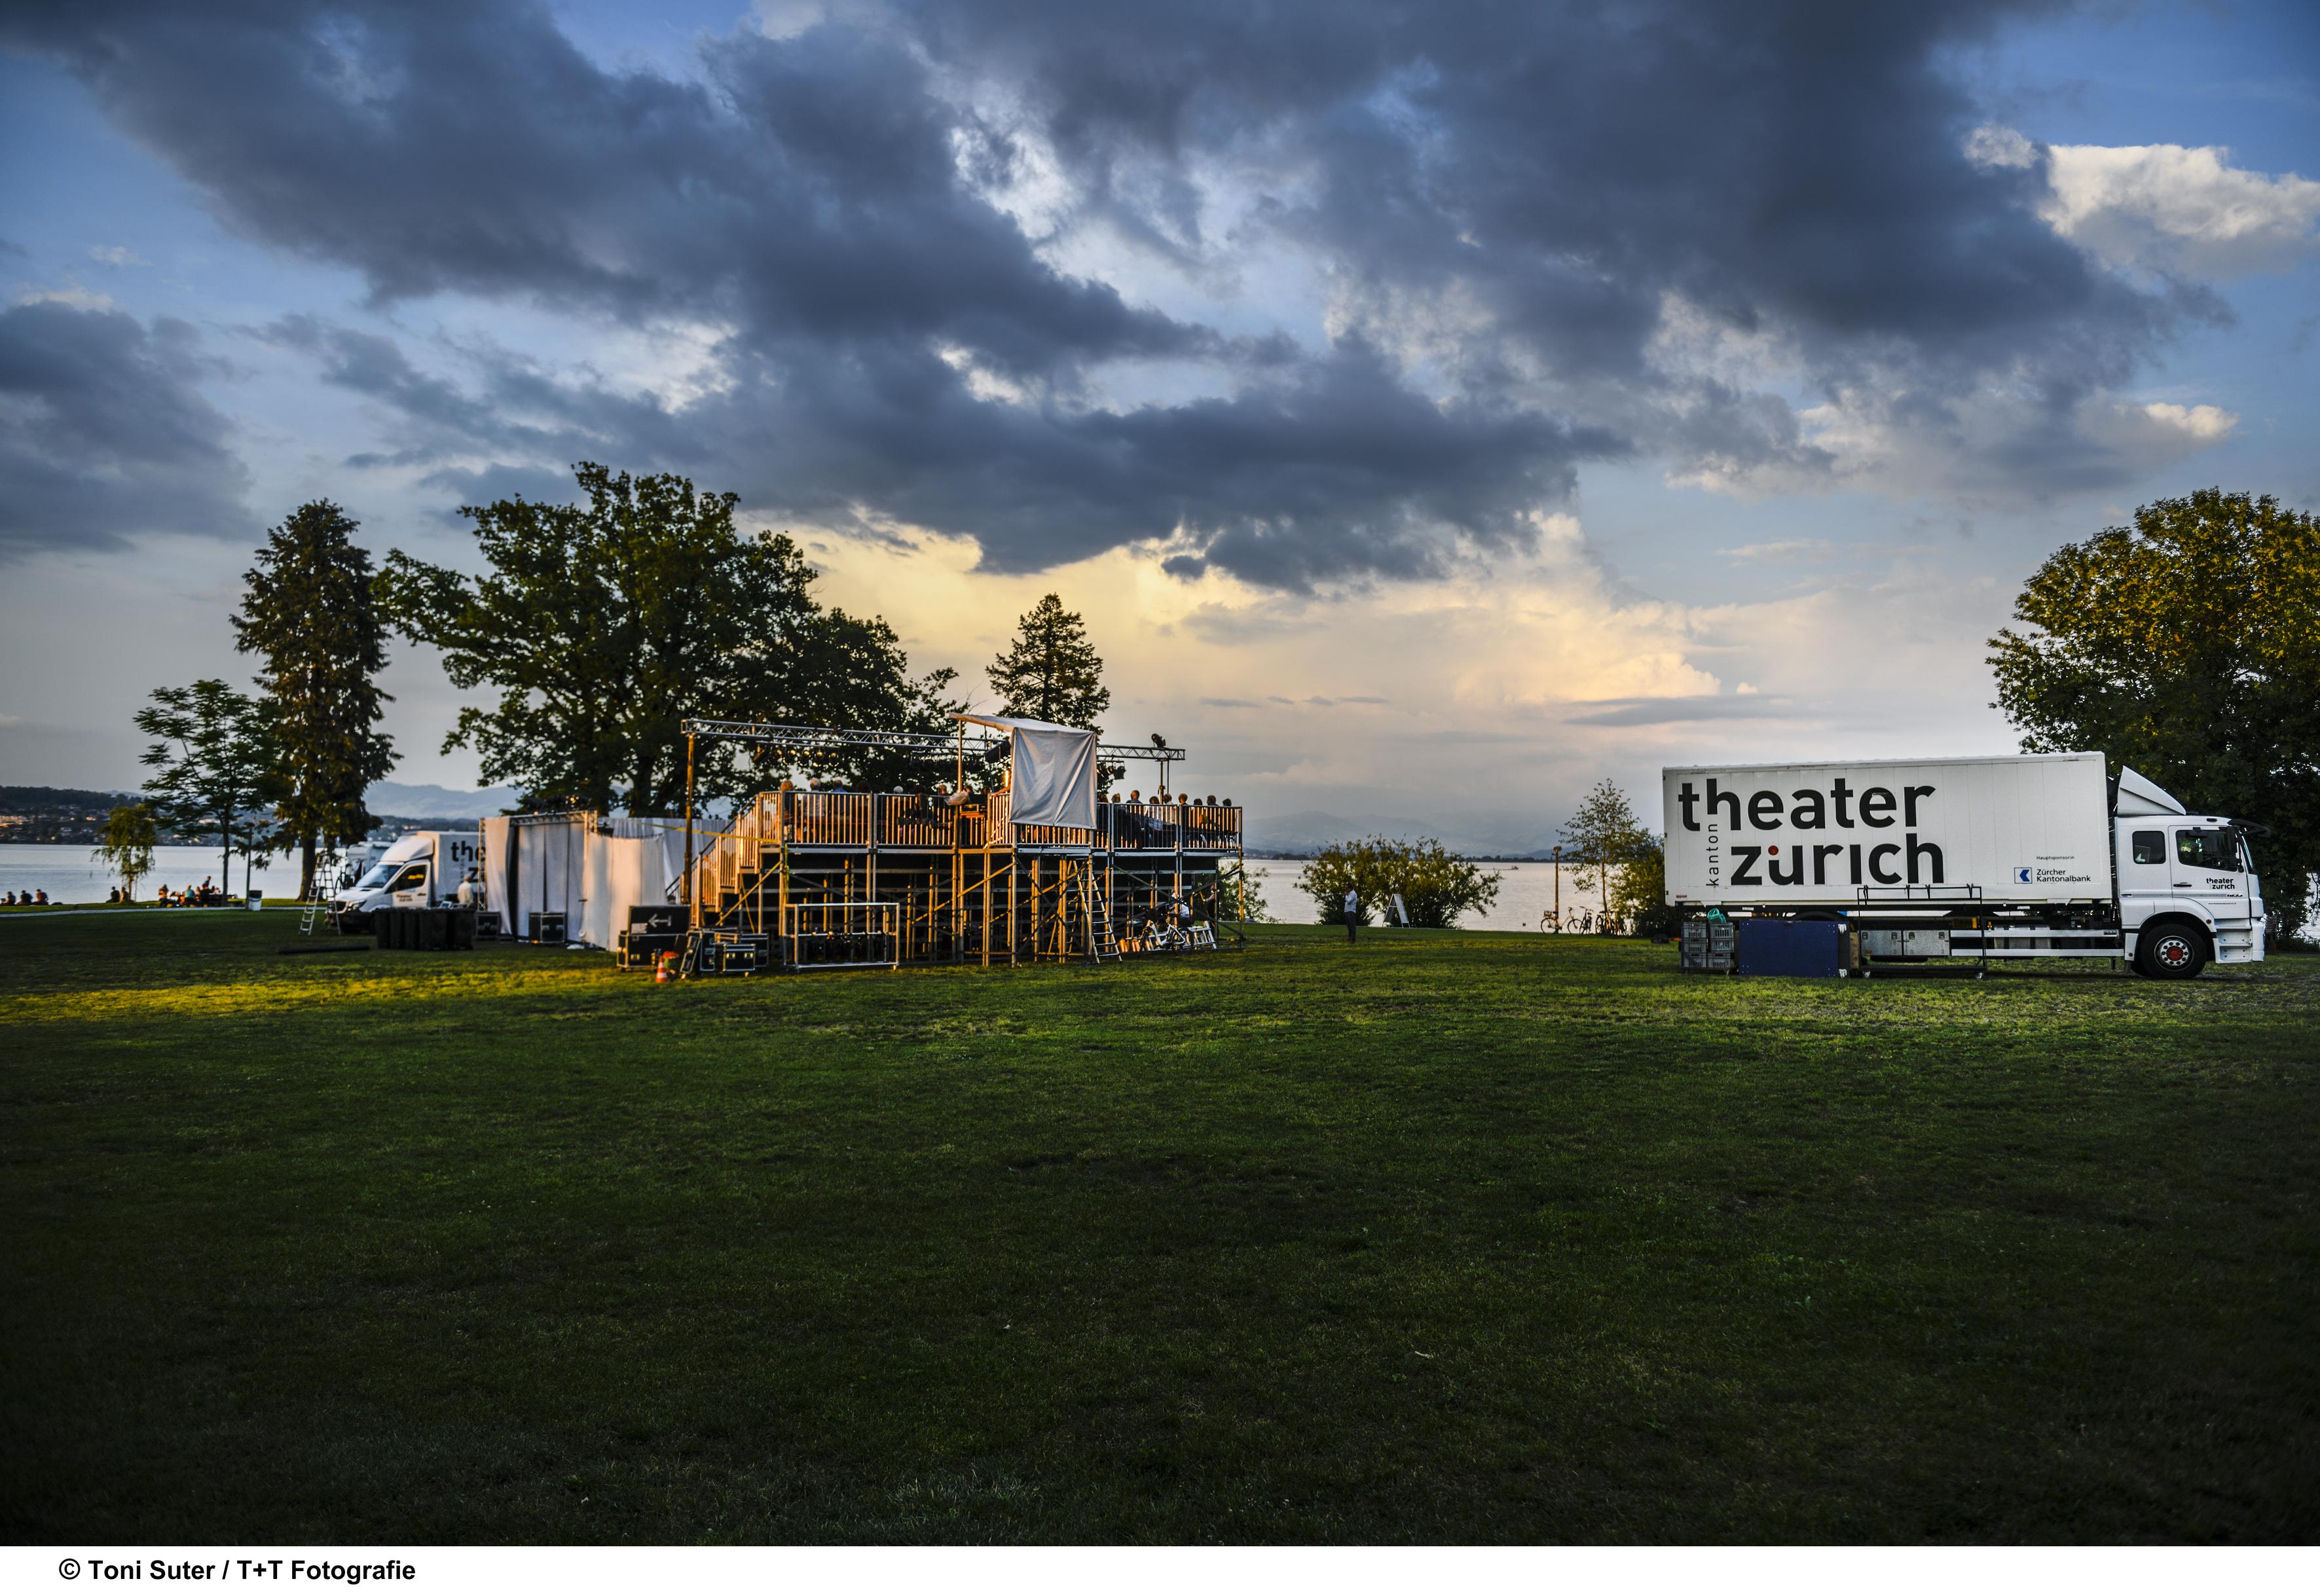 Holzers Peepshow Freilichttheater